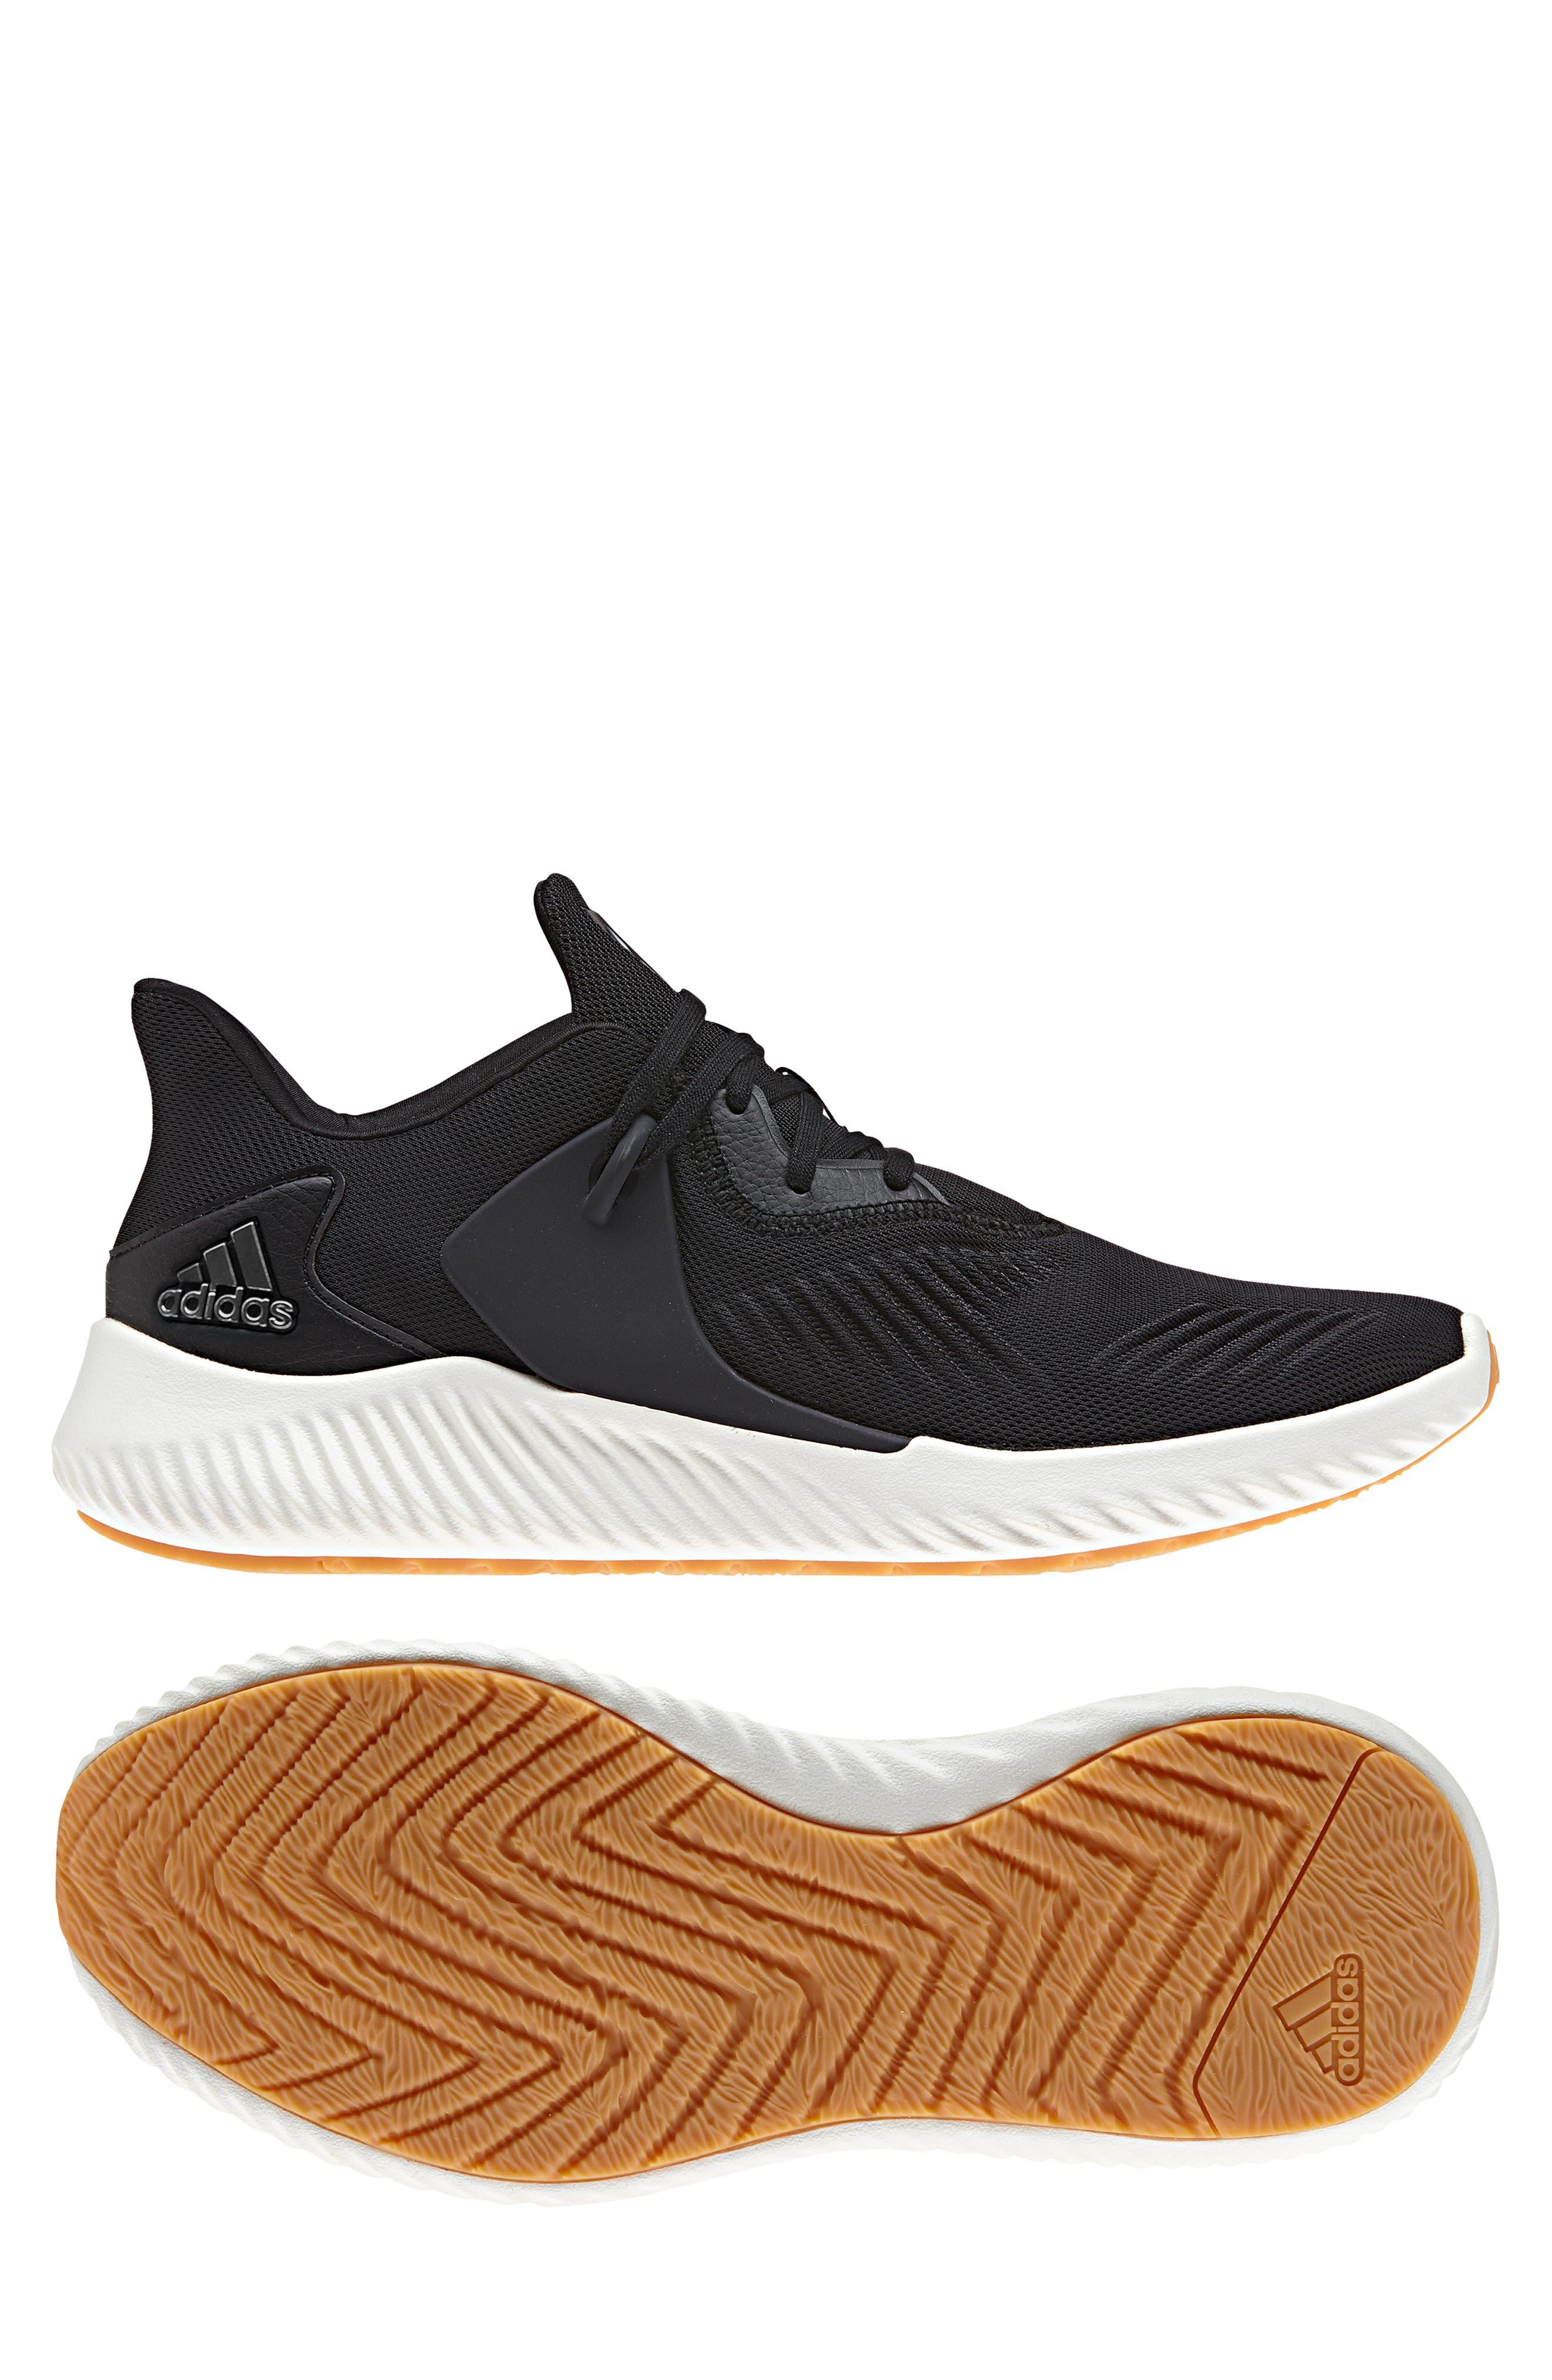 AlphaBounce RC 2 Running Shoe,                             Alternate thumbnail 9, color,                             CORE BLACK/ NIGHT/ CORE BLACK